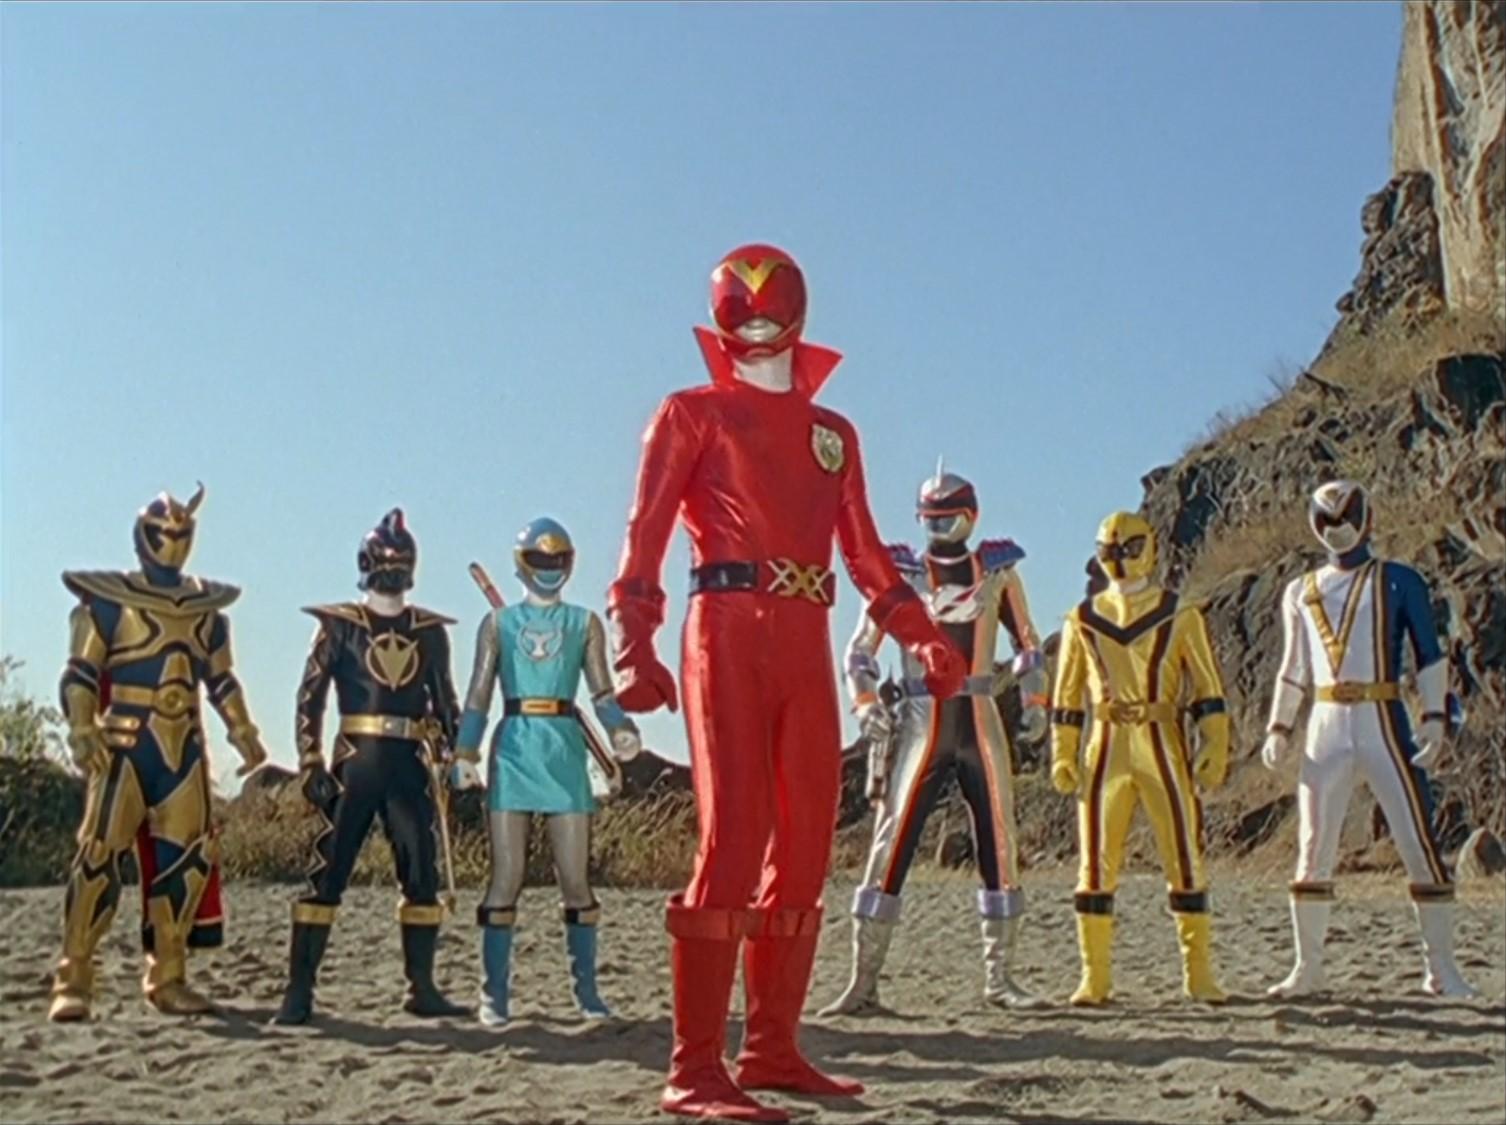 File:AkaRed's Sentai Team.jpg